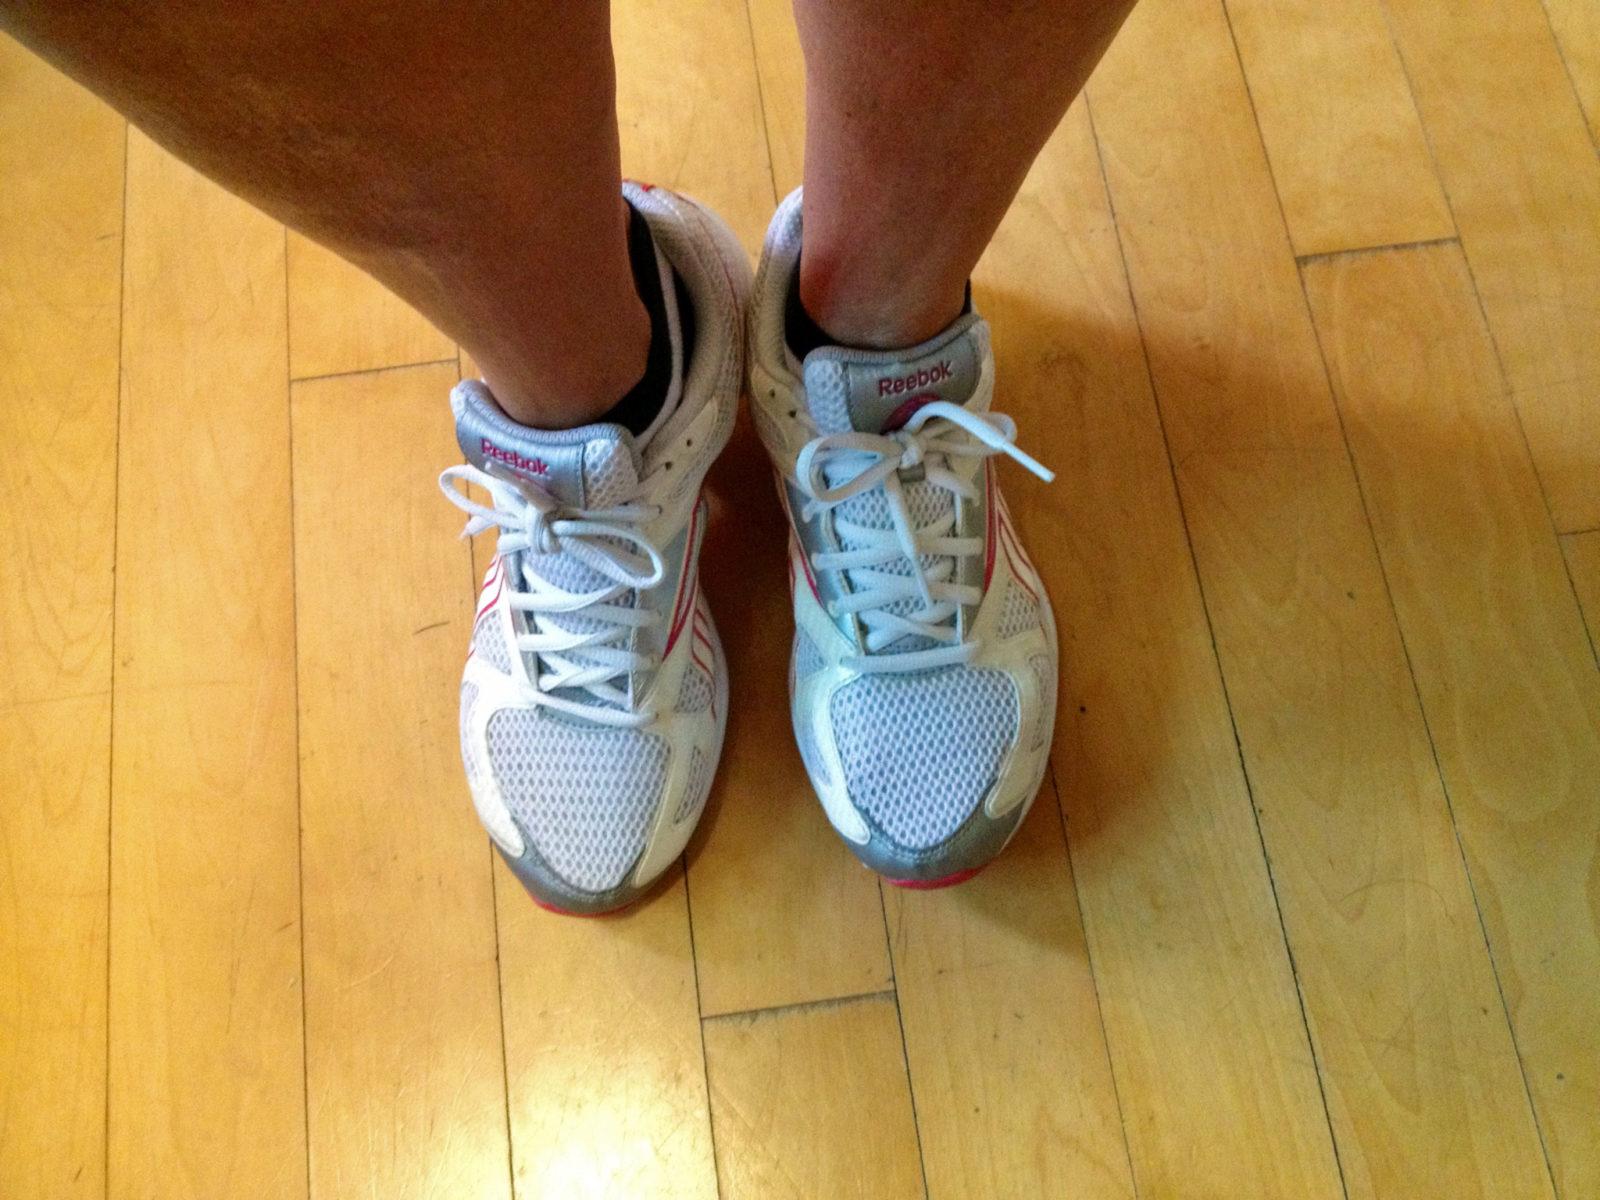 My traveling feet